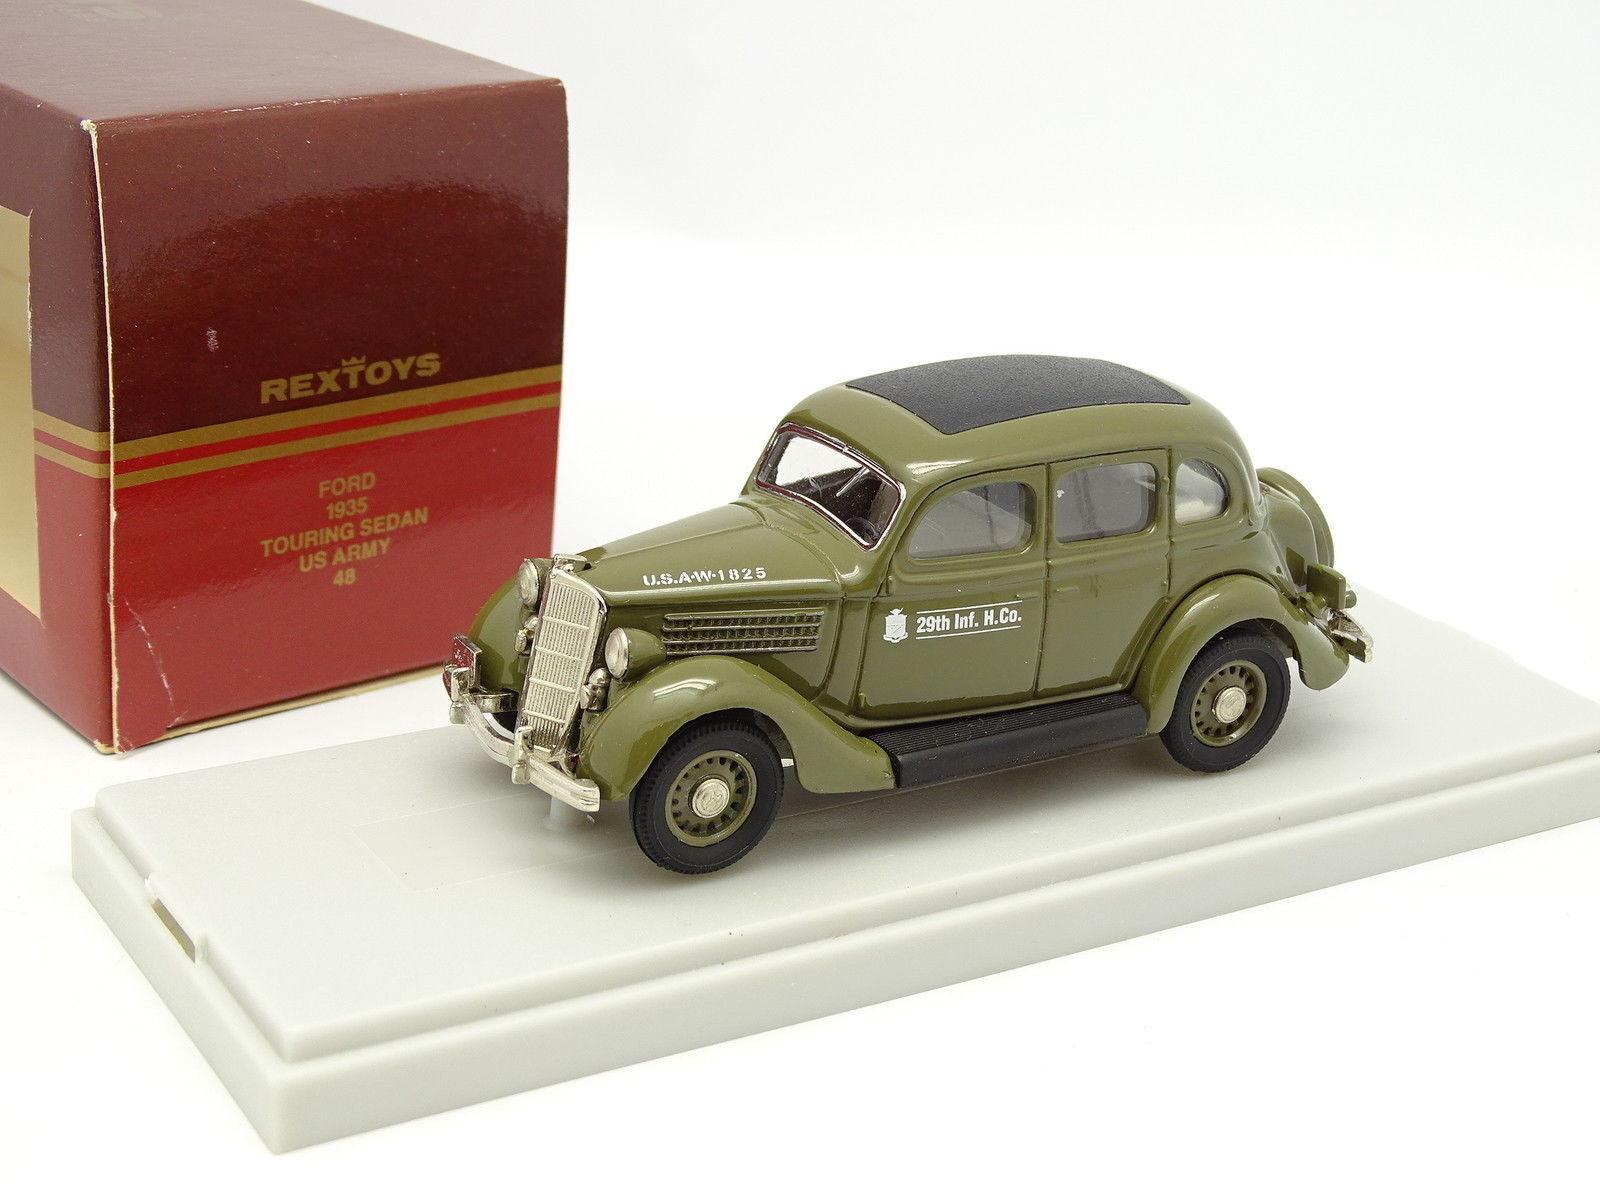 Rextoys 1 43 - Ford 1935 touring US Armee Militär